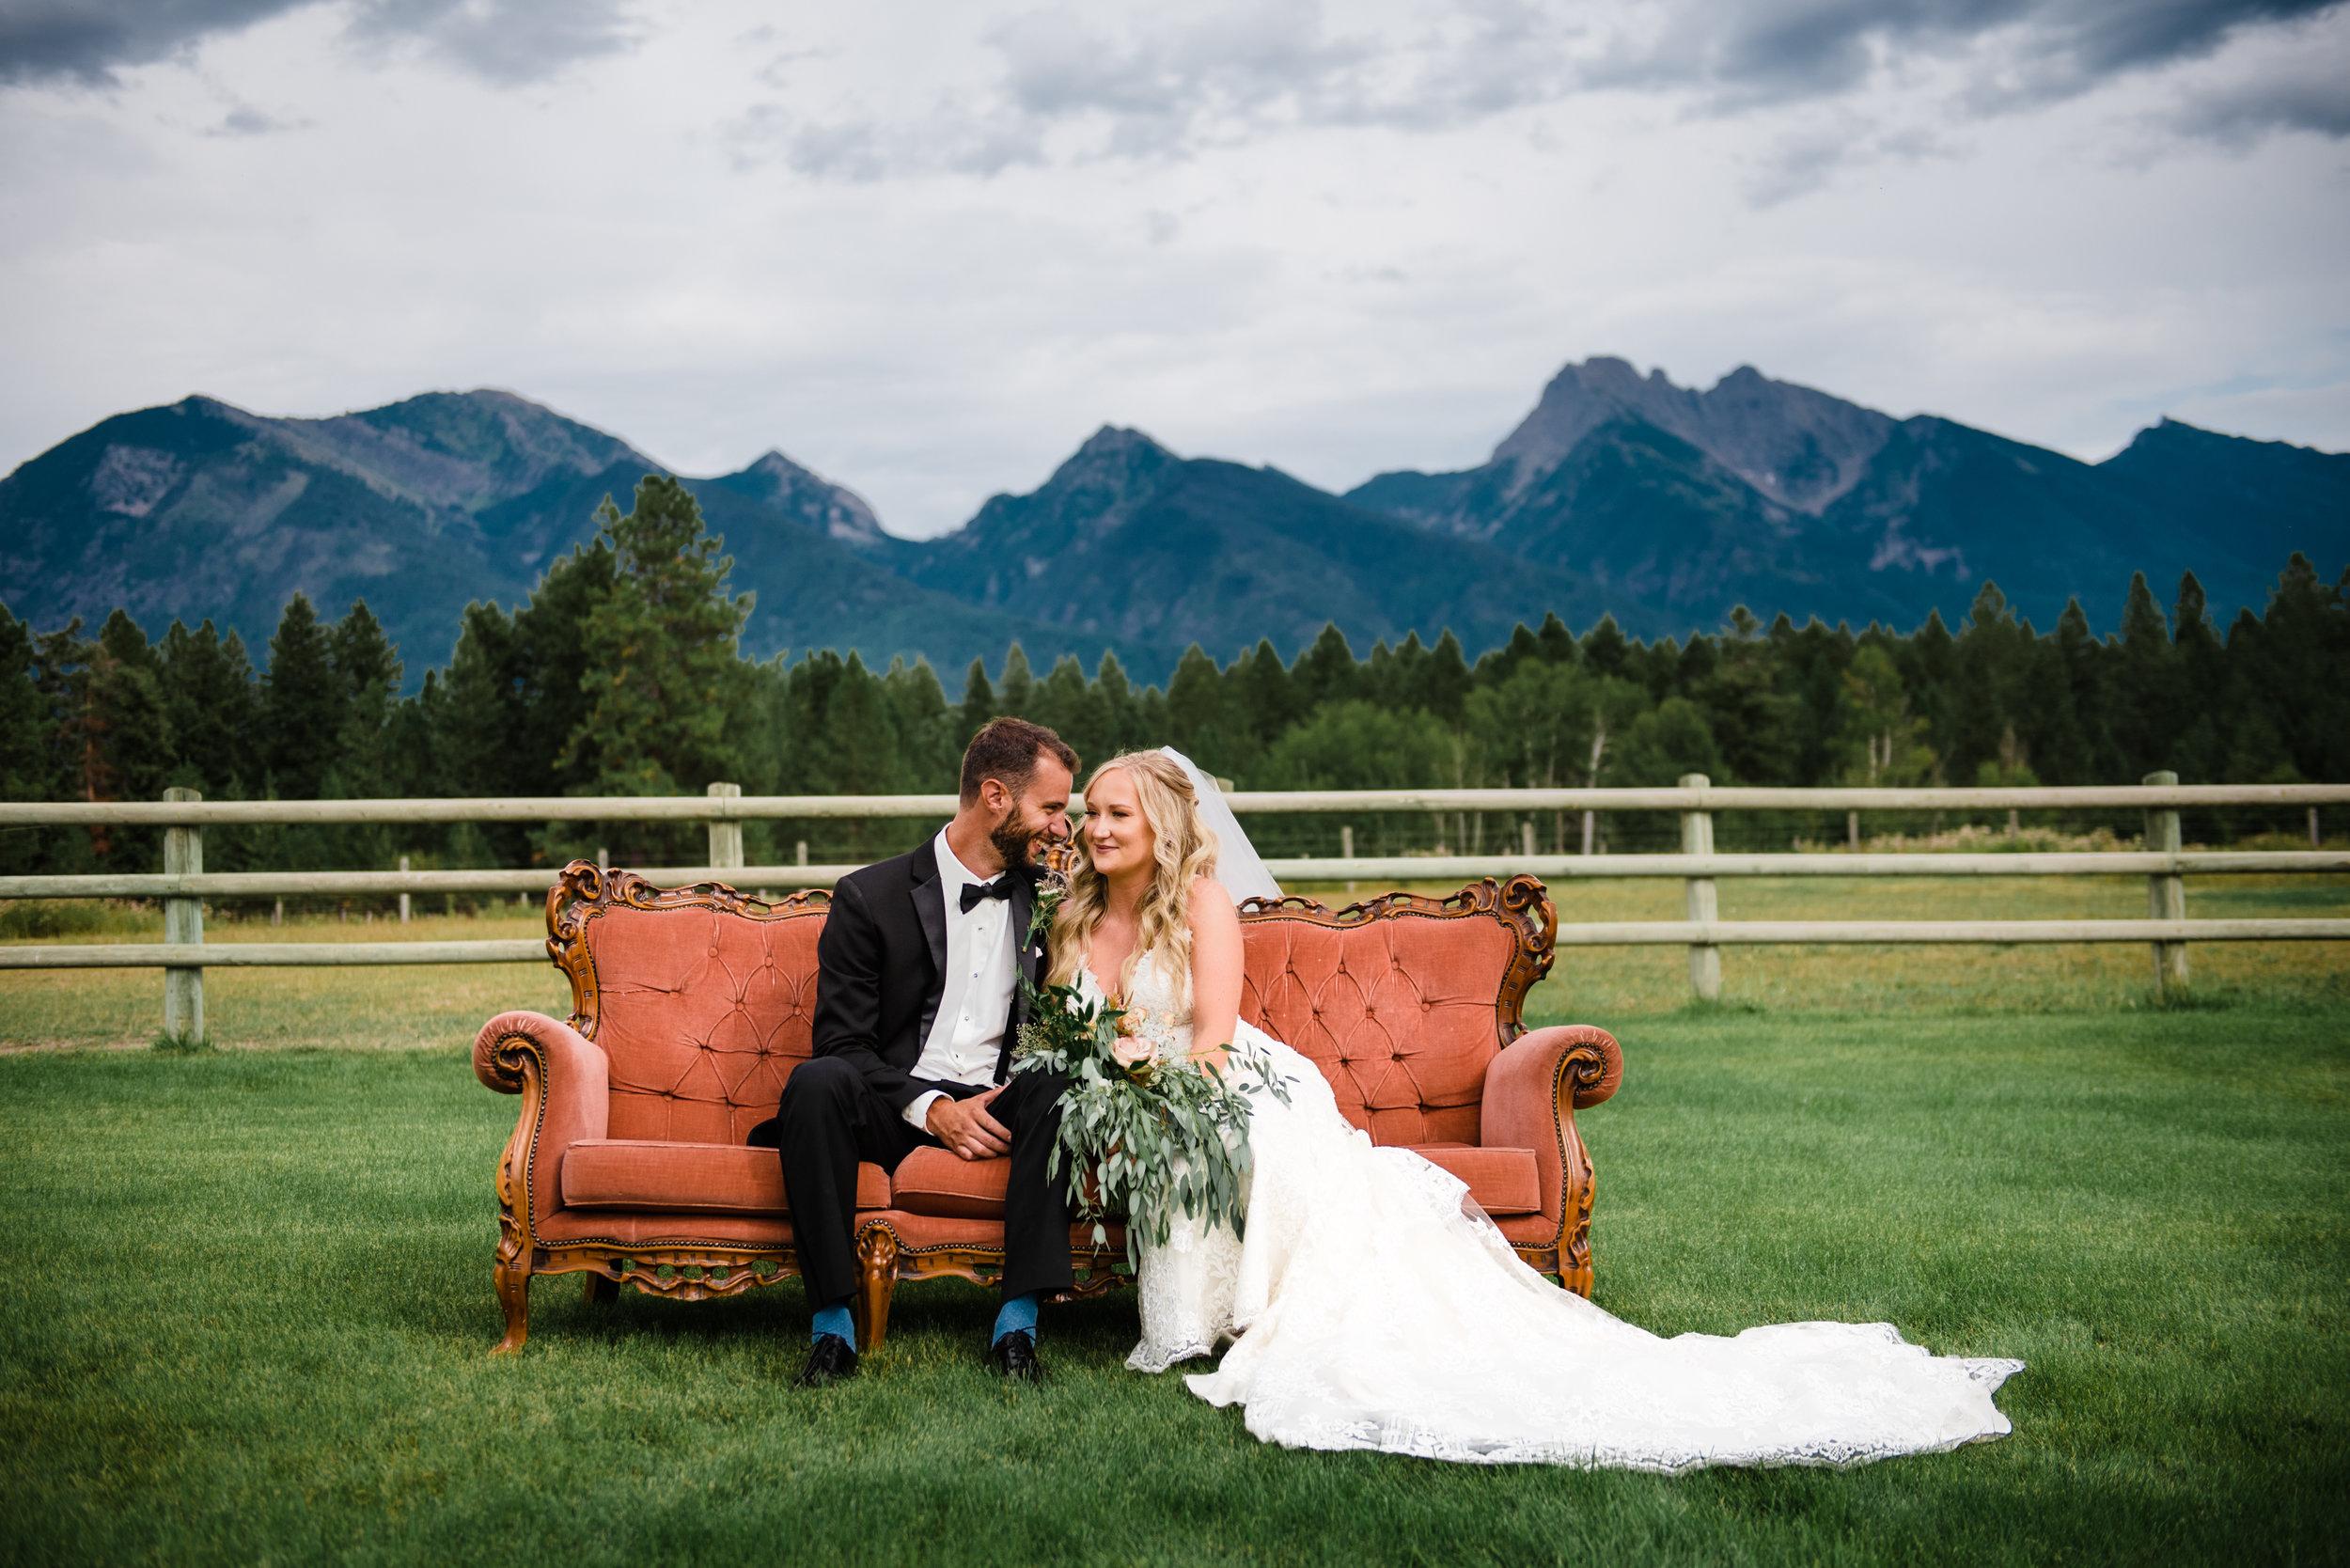 037Sky Ridge Ranch Wedding_Montana Wedding Photographer_Jessica & Brian_Honeybee Weddings_August 24, 2019-25.jpg